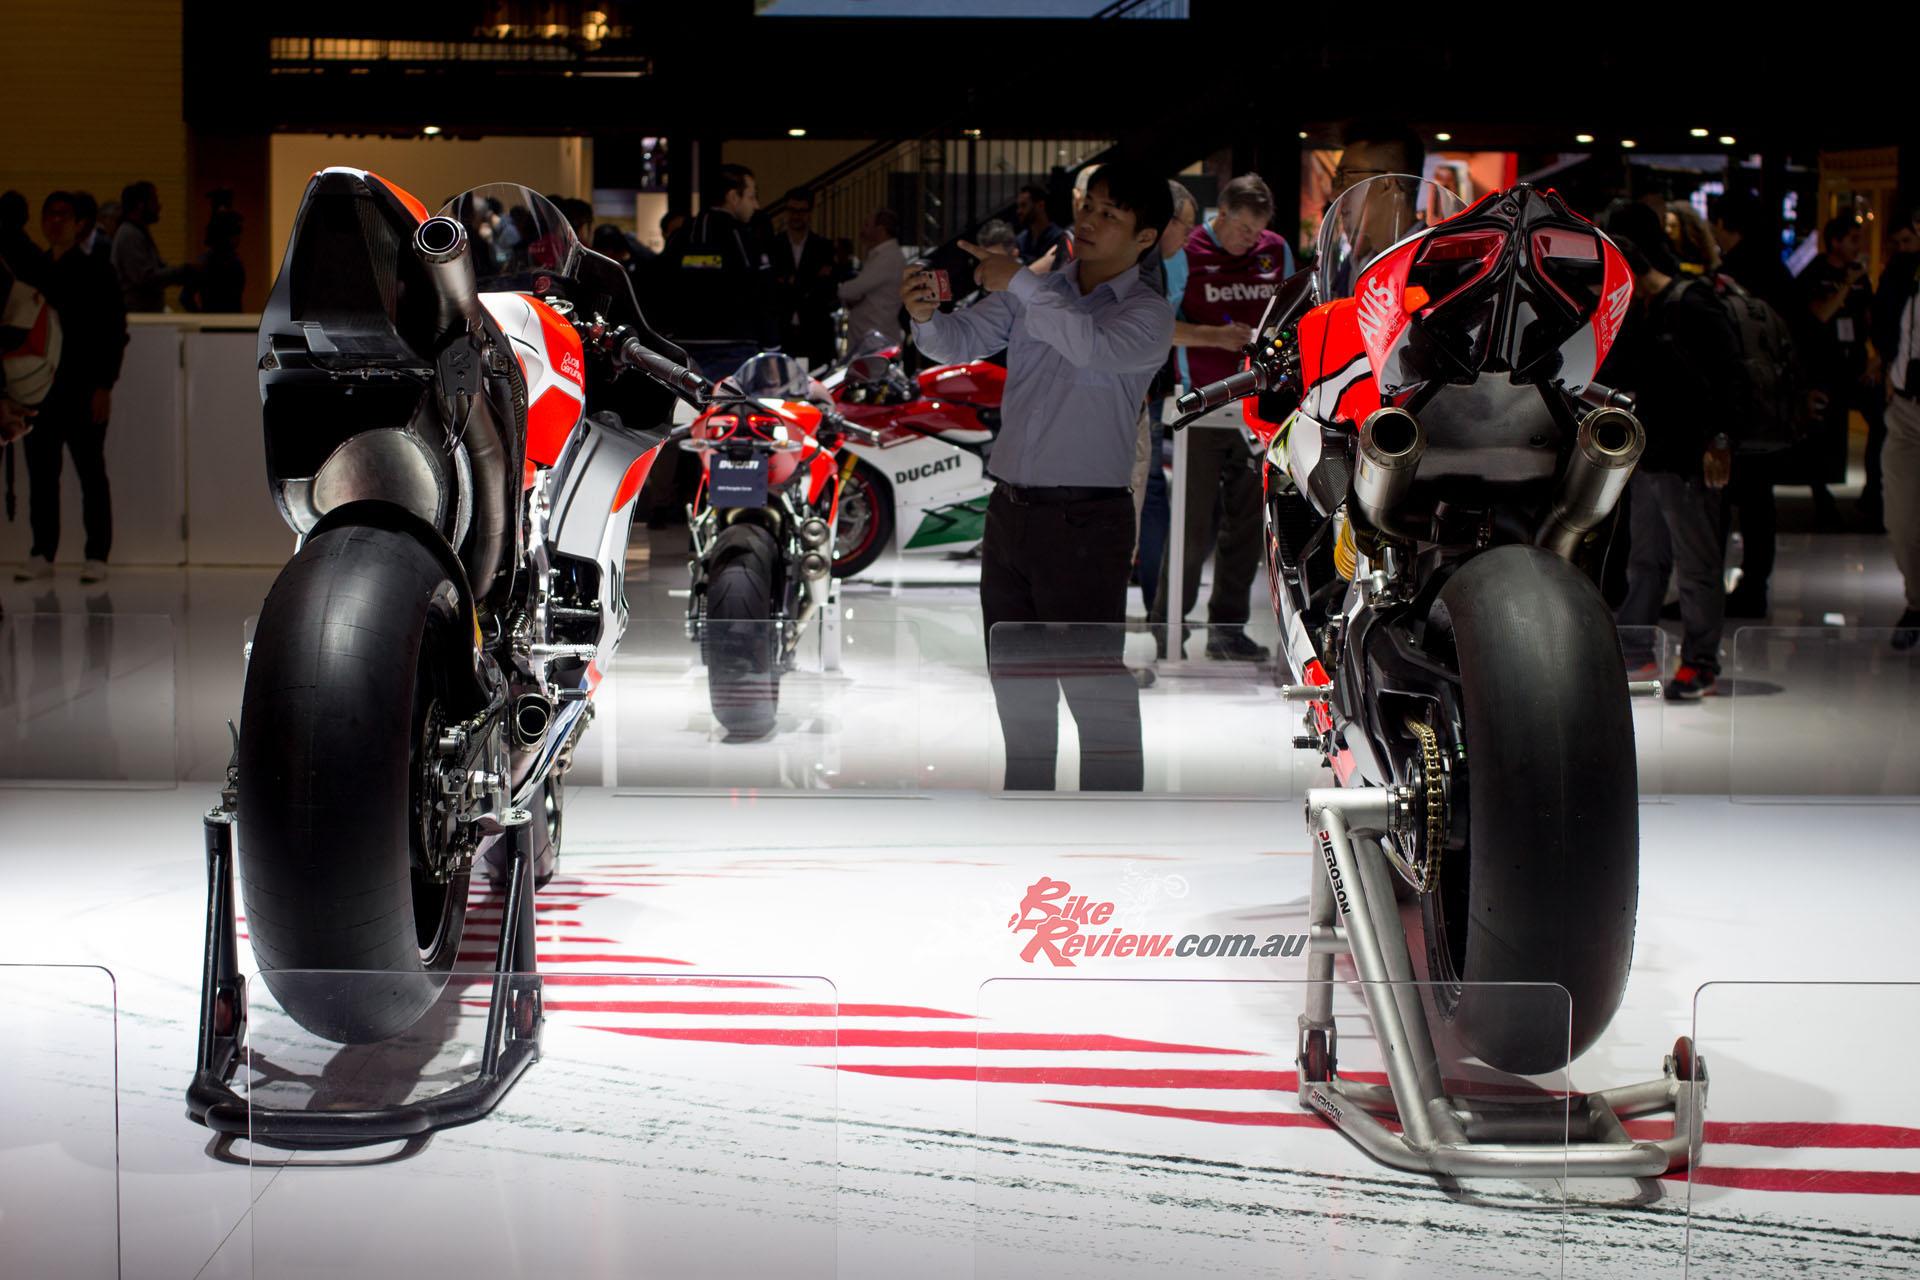 Ducati's EICMA display